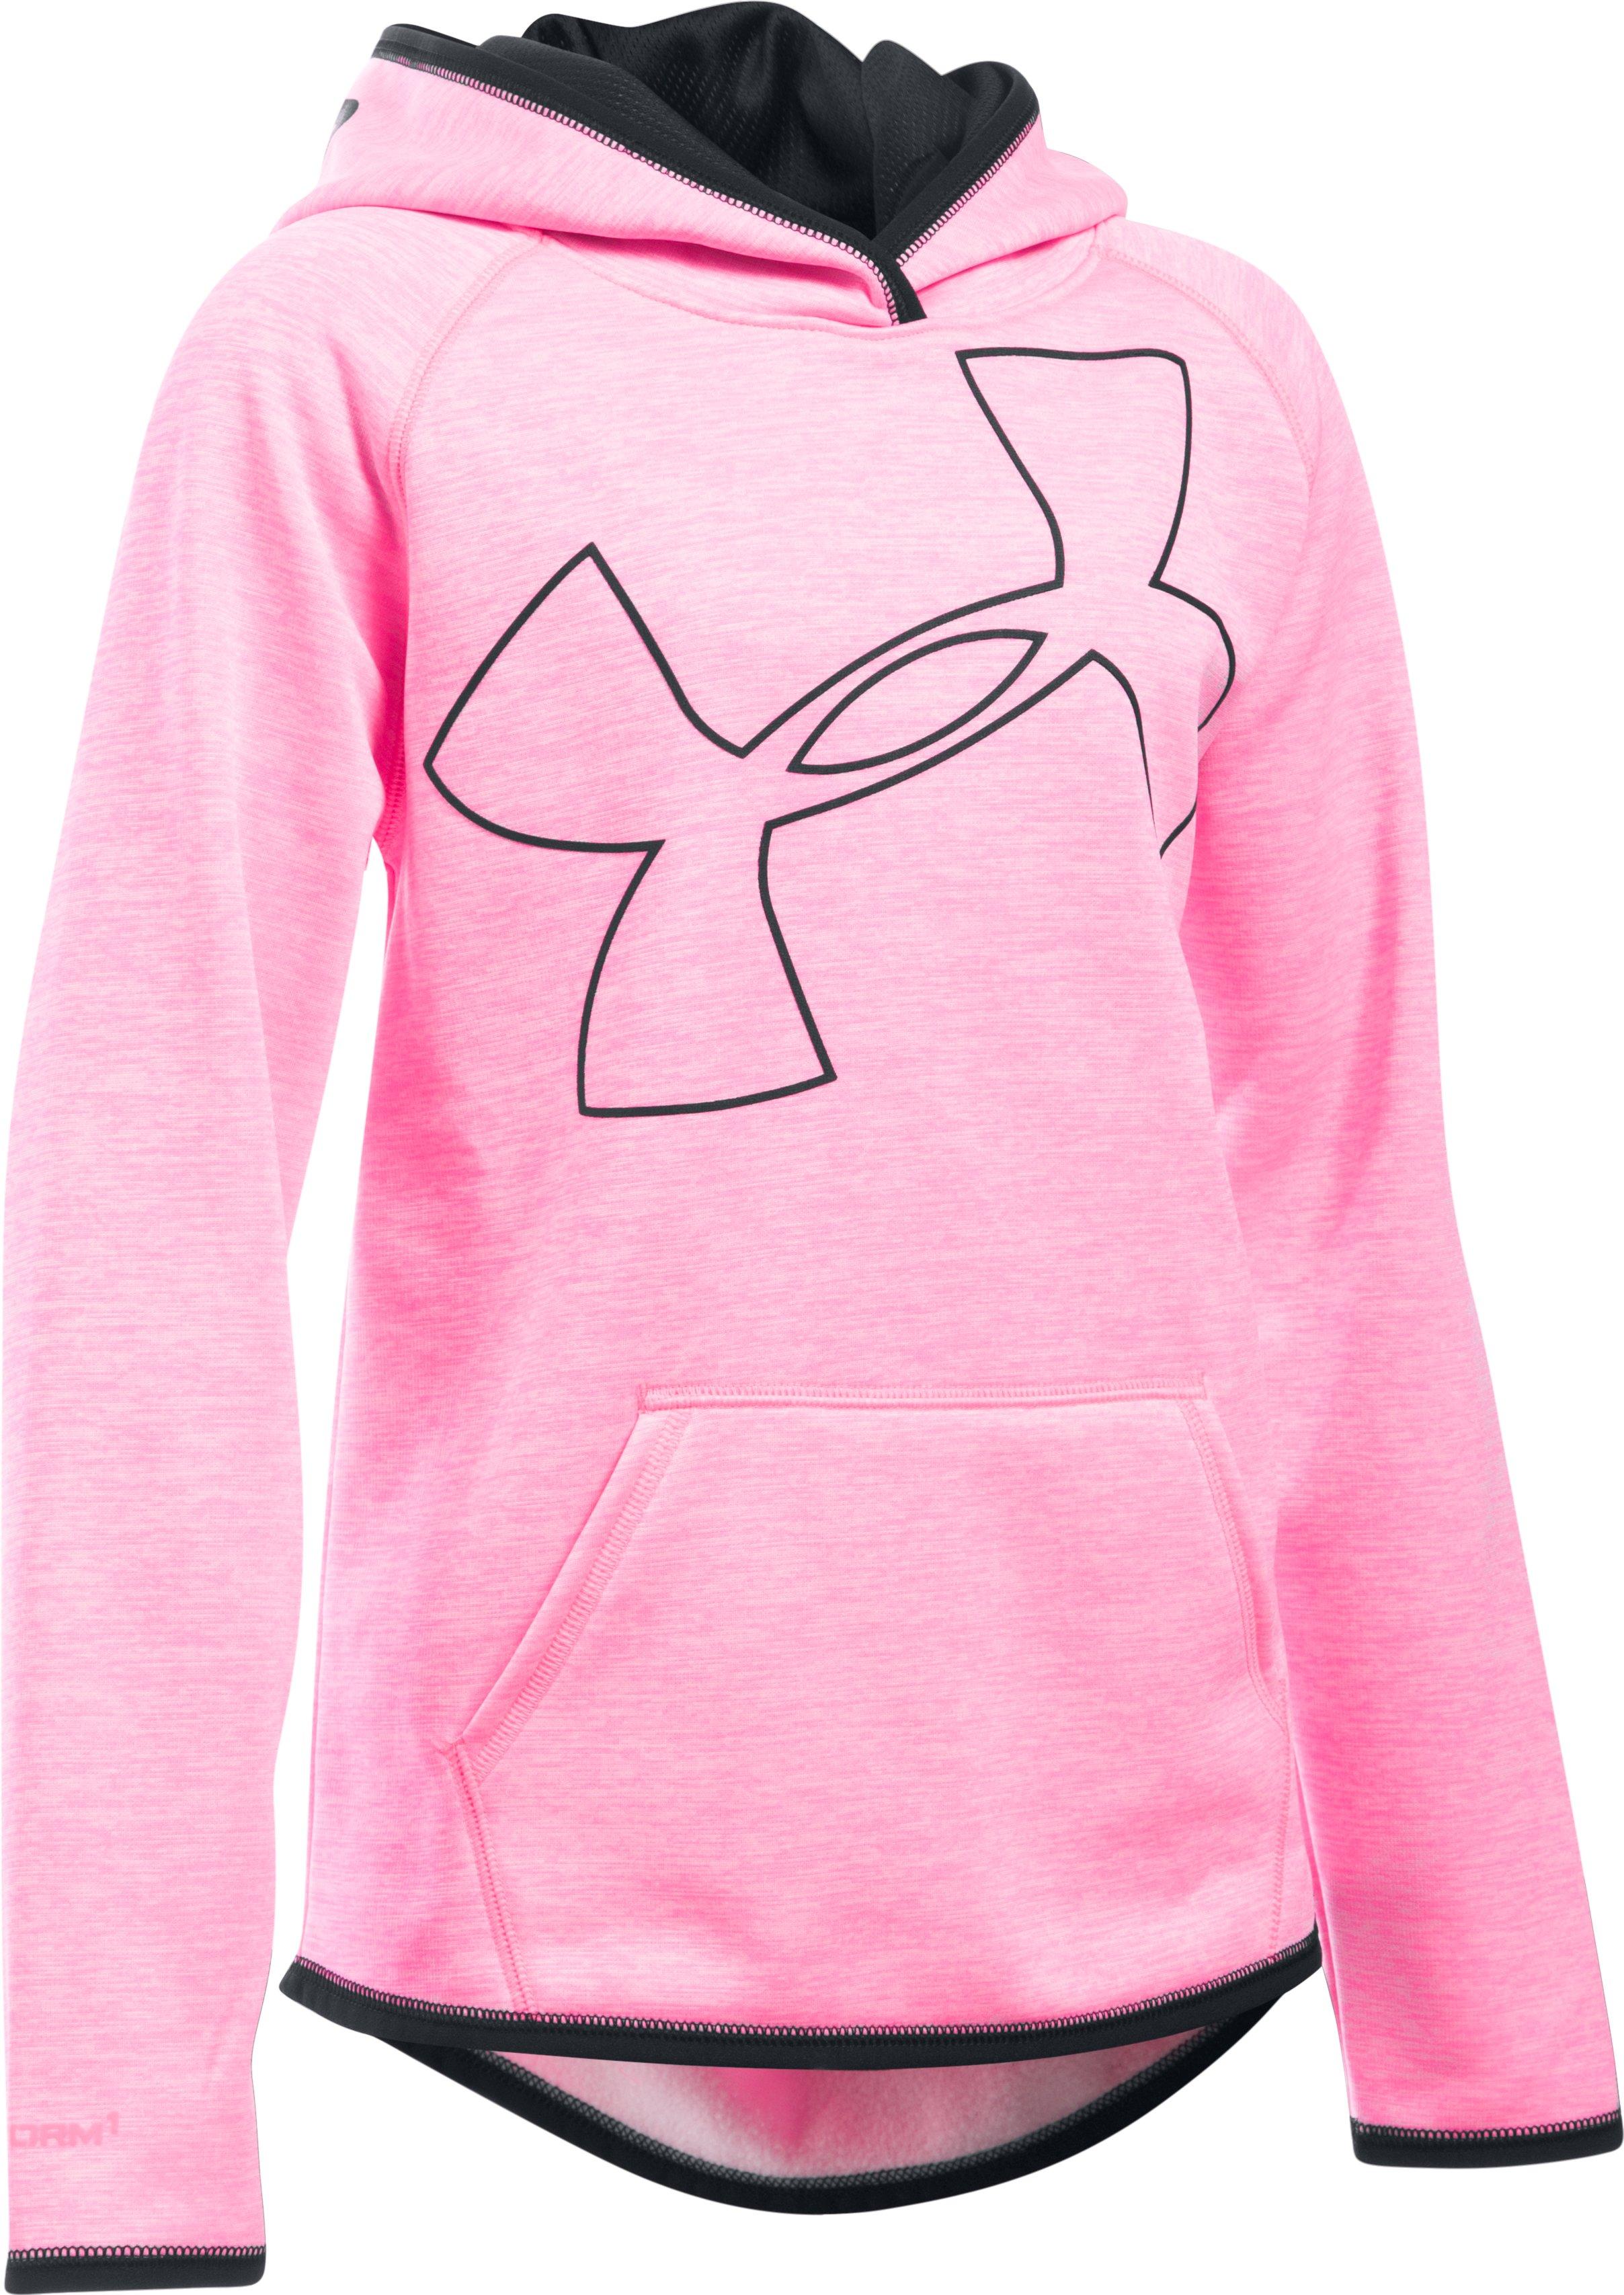 Girls' UA Armour® Fleece Novelty Jumbo Logo Hoodie | Under Armour US